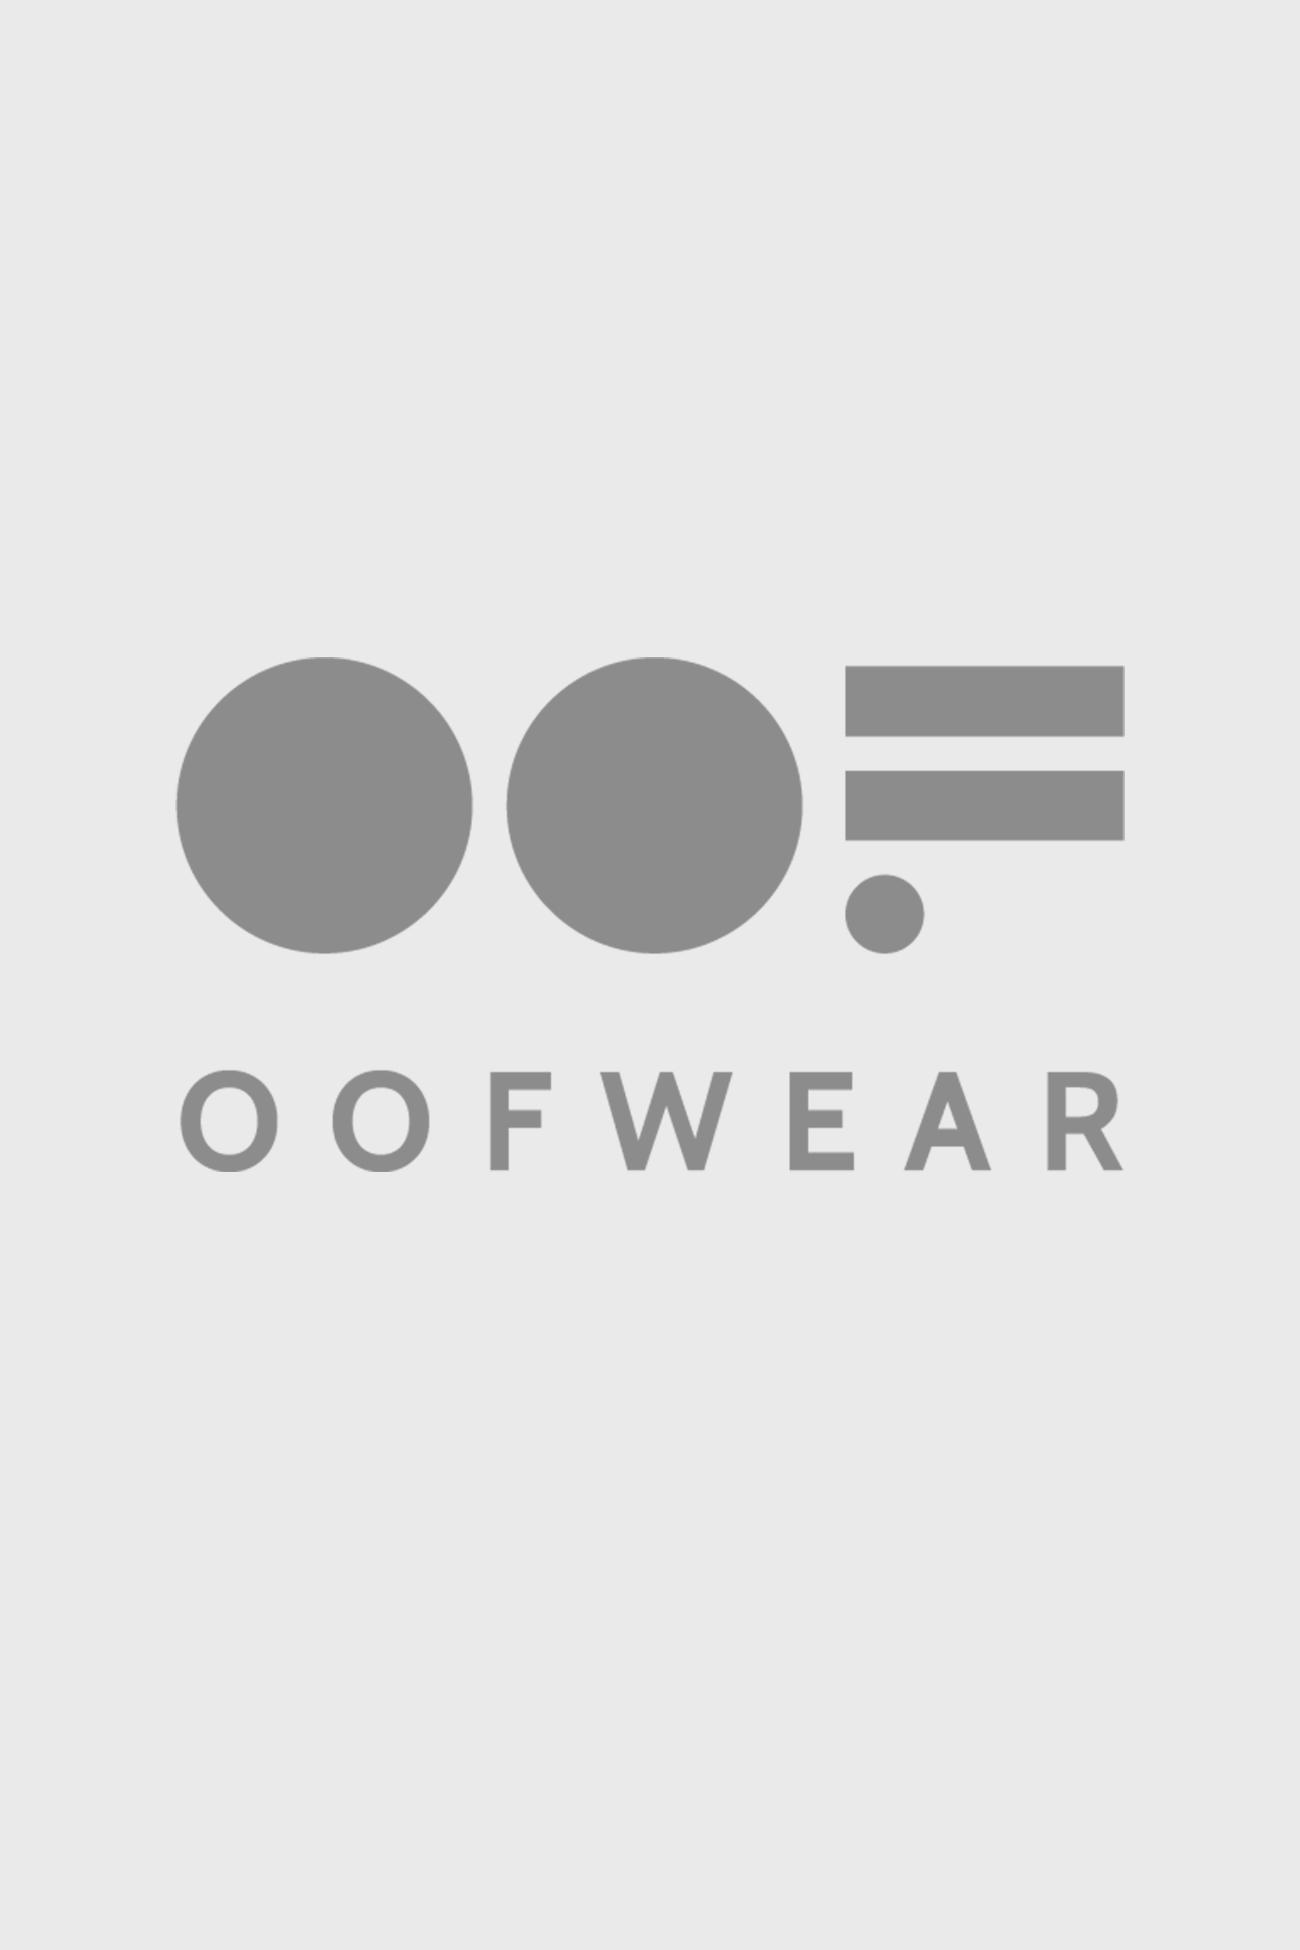 Women's oversized shirt style sweatshirt in black cotton and jersey